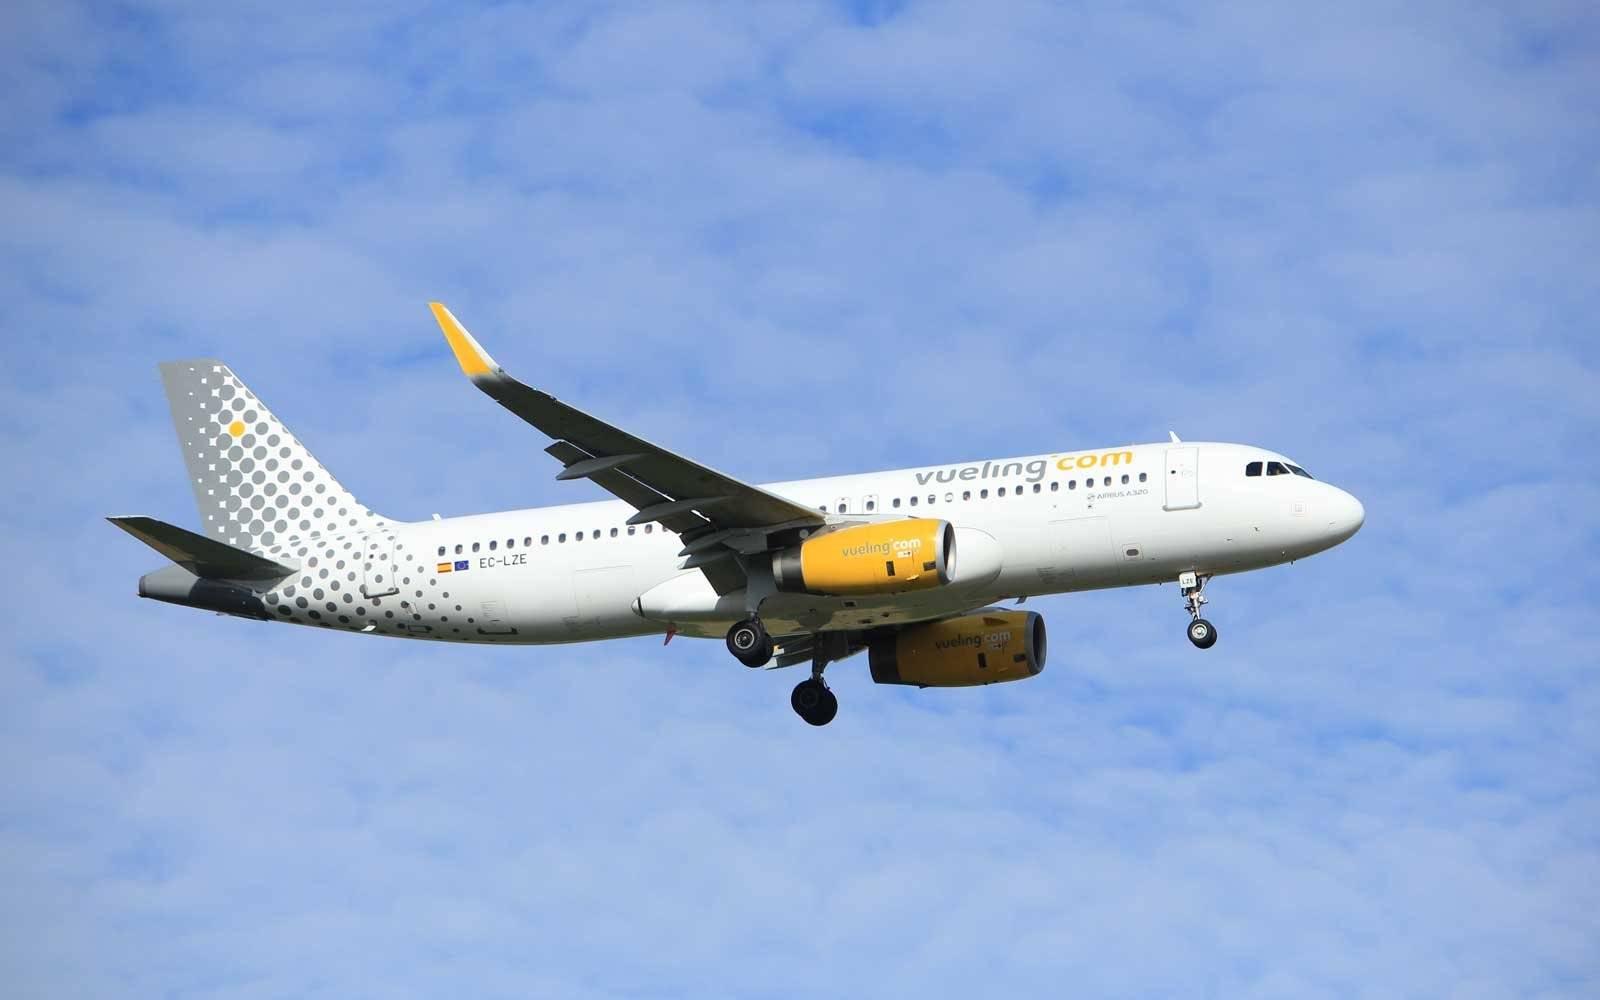 Авиакомпания vueling airlines: авиабилеты, спецпредложения и рейсы от авиакомпании vueling airlines